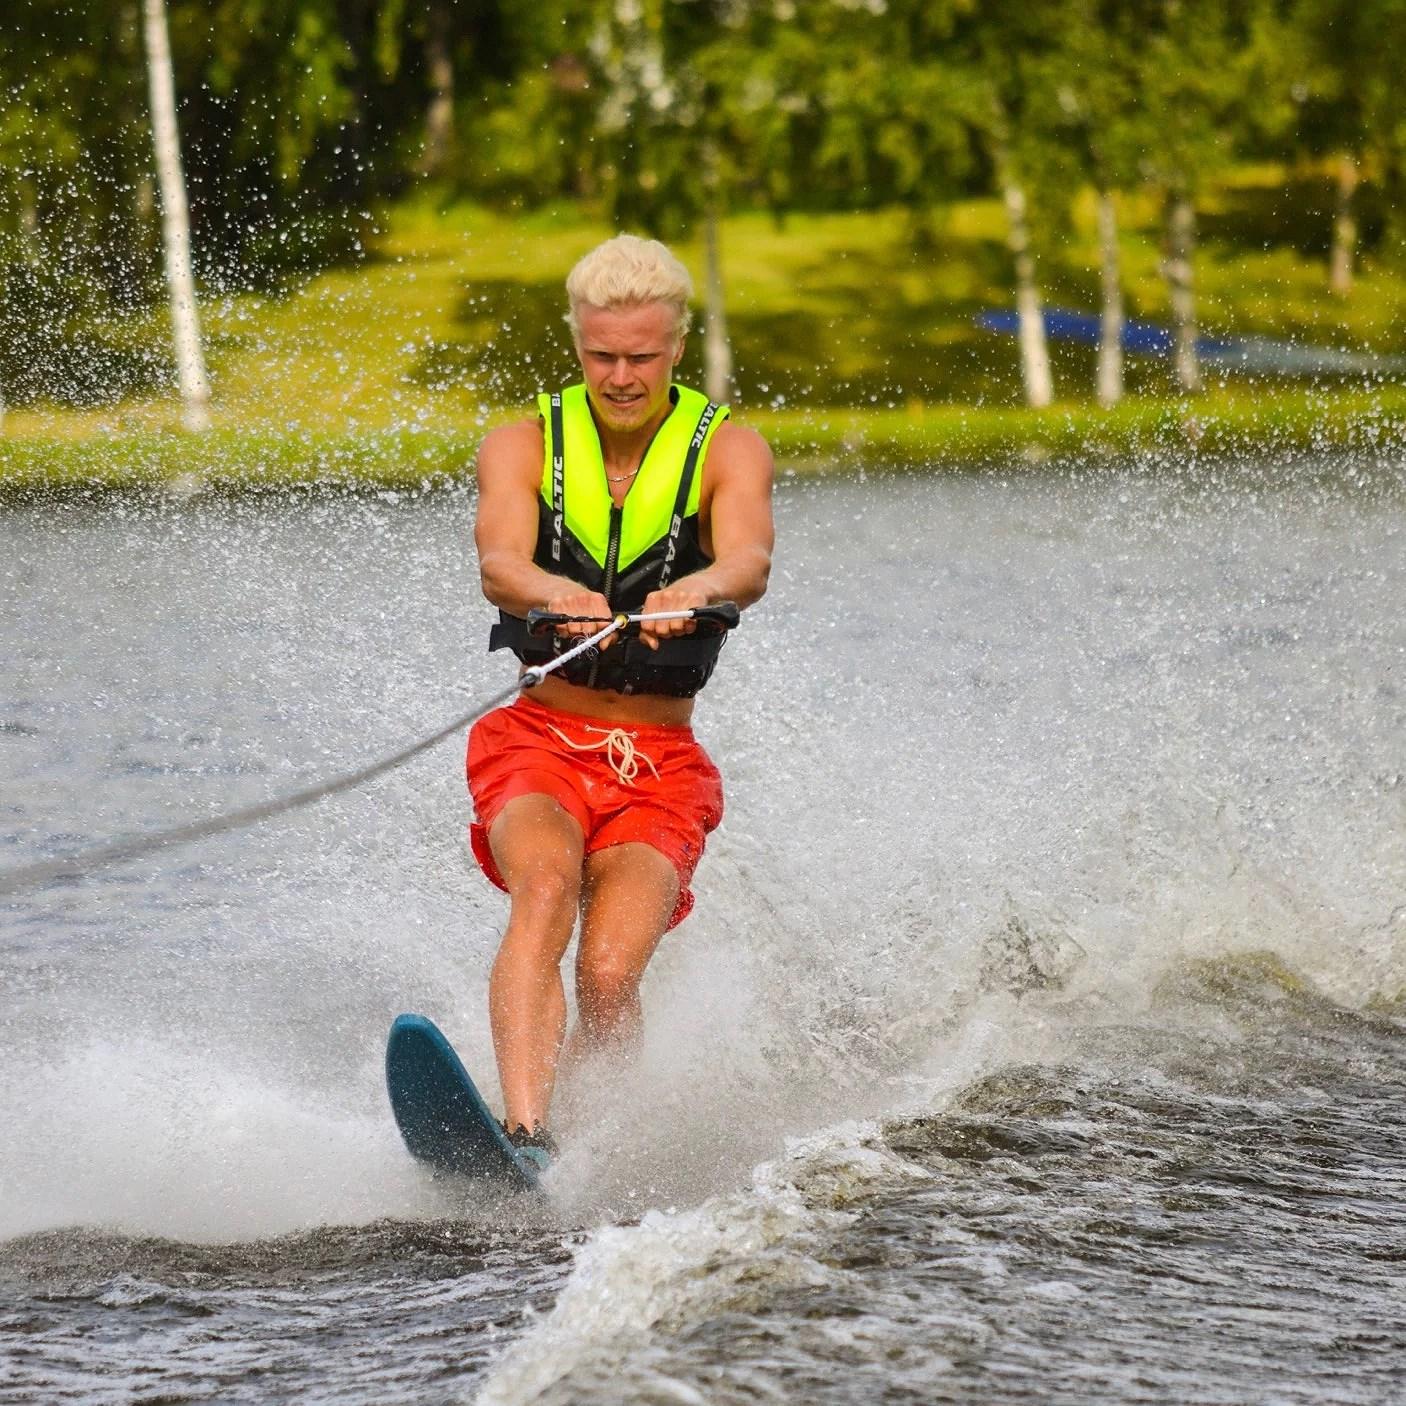 Man kan allt ha bra skojj på sjön!